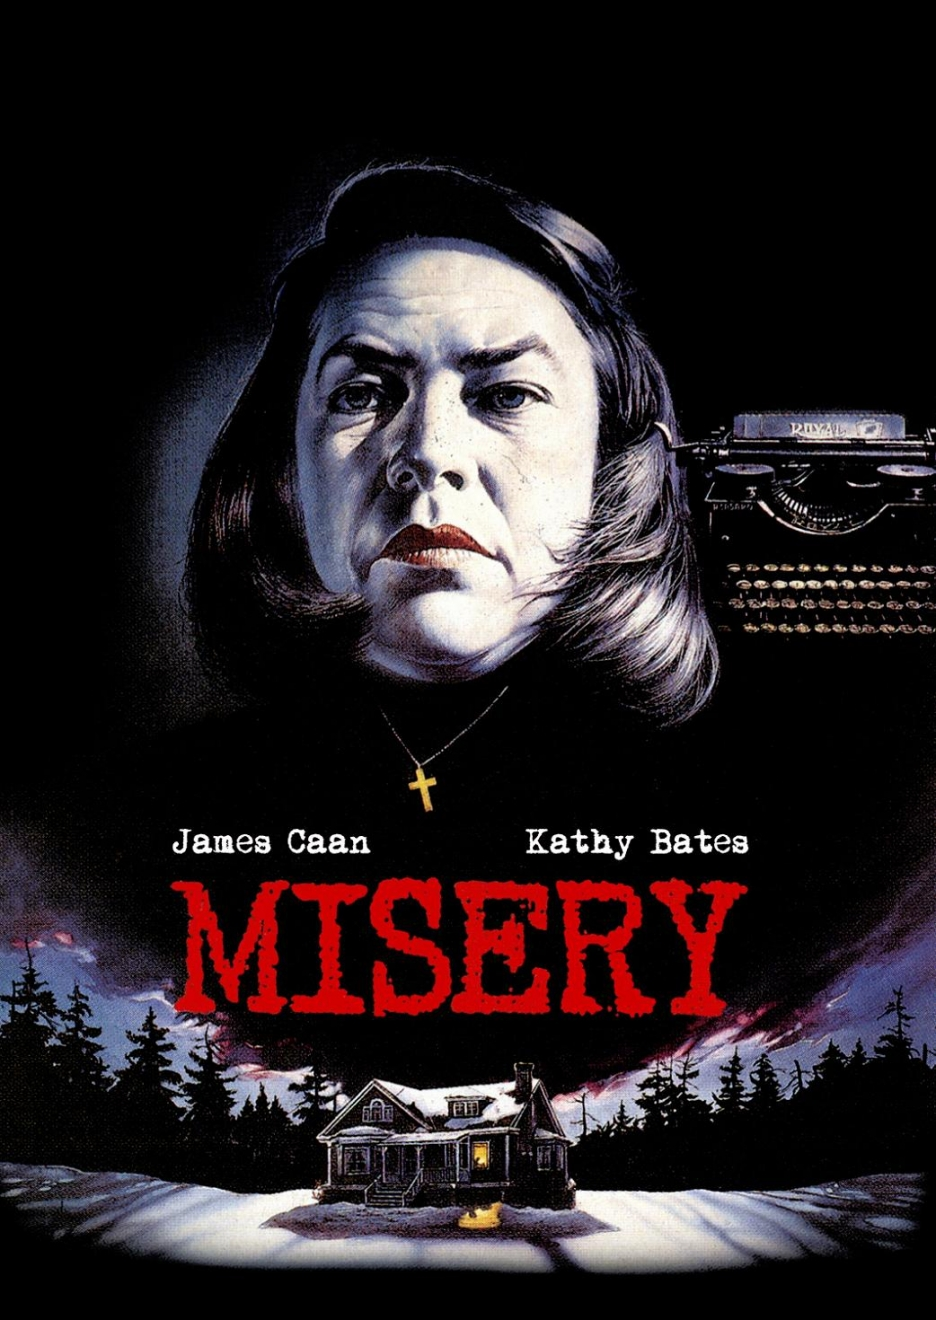 misery - photo #2